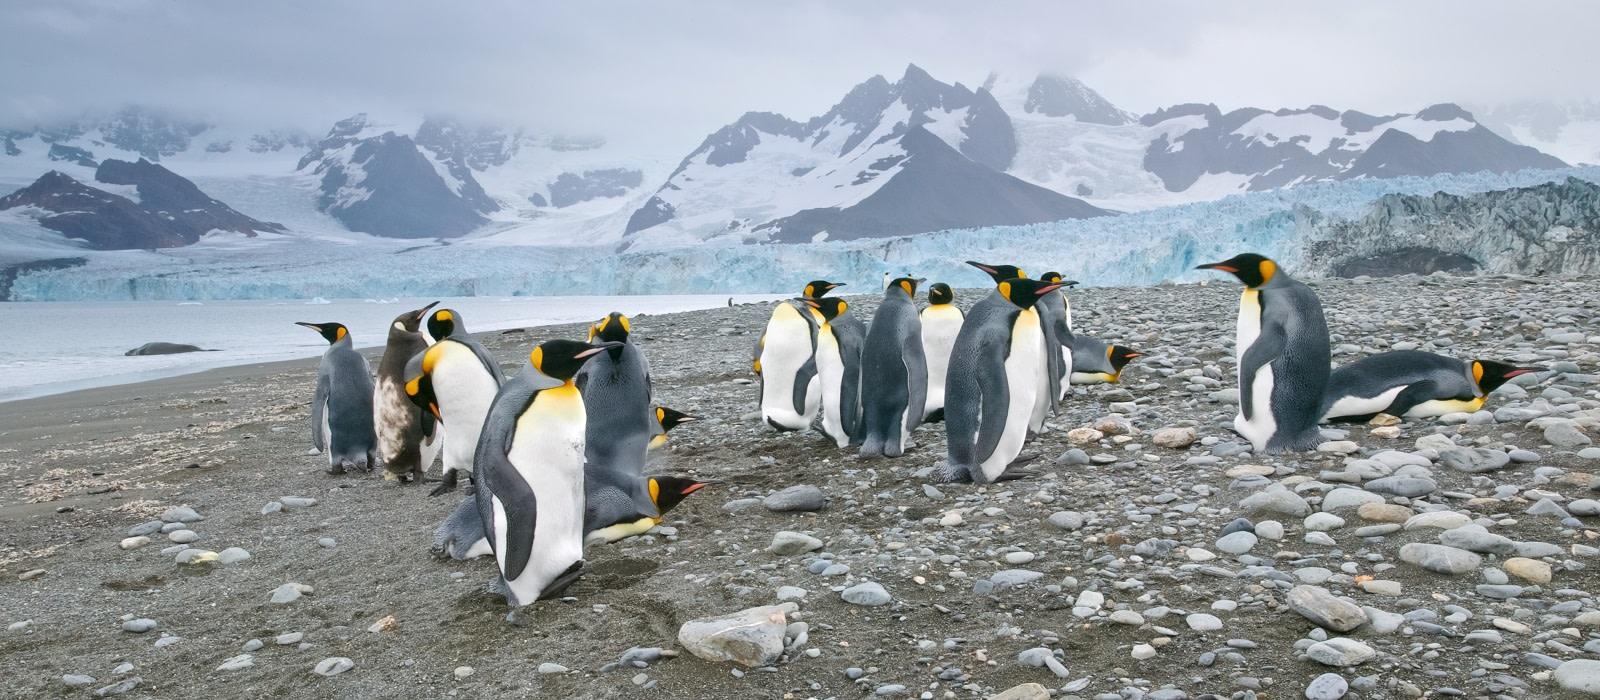 Penguin Safari: South Georgia and Antarctic Peninsula Tour Trip 1